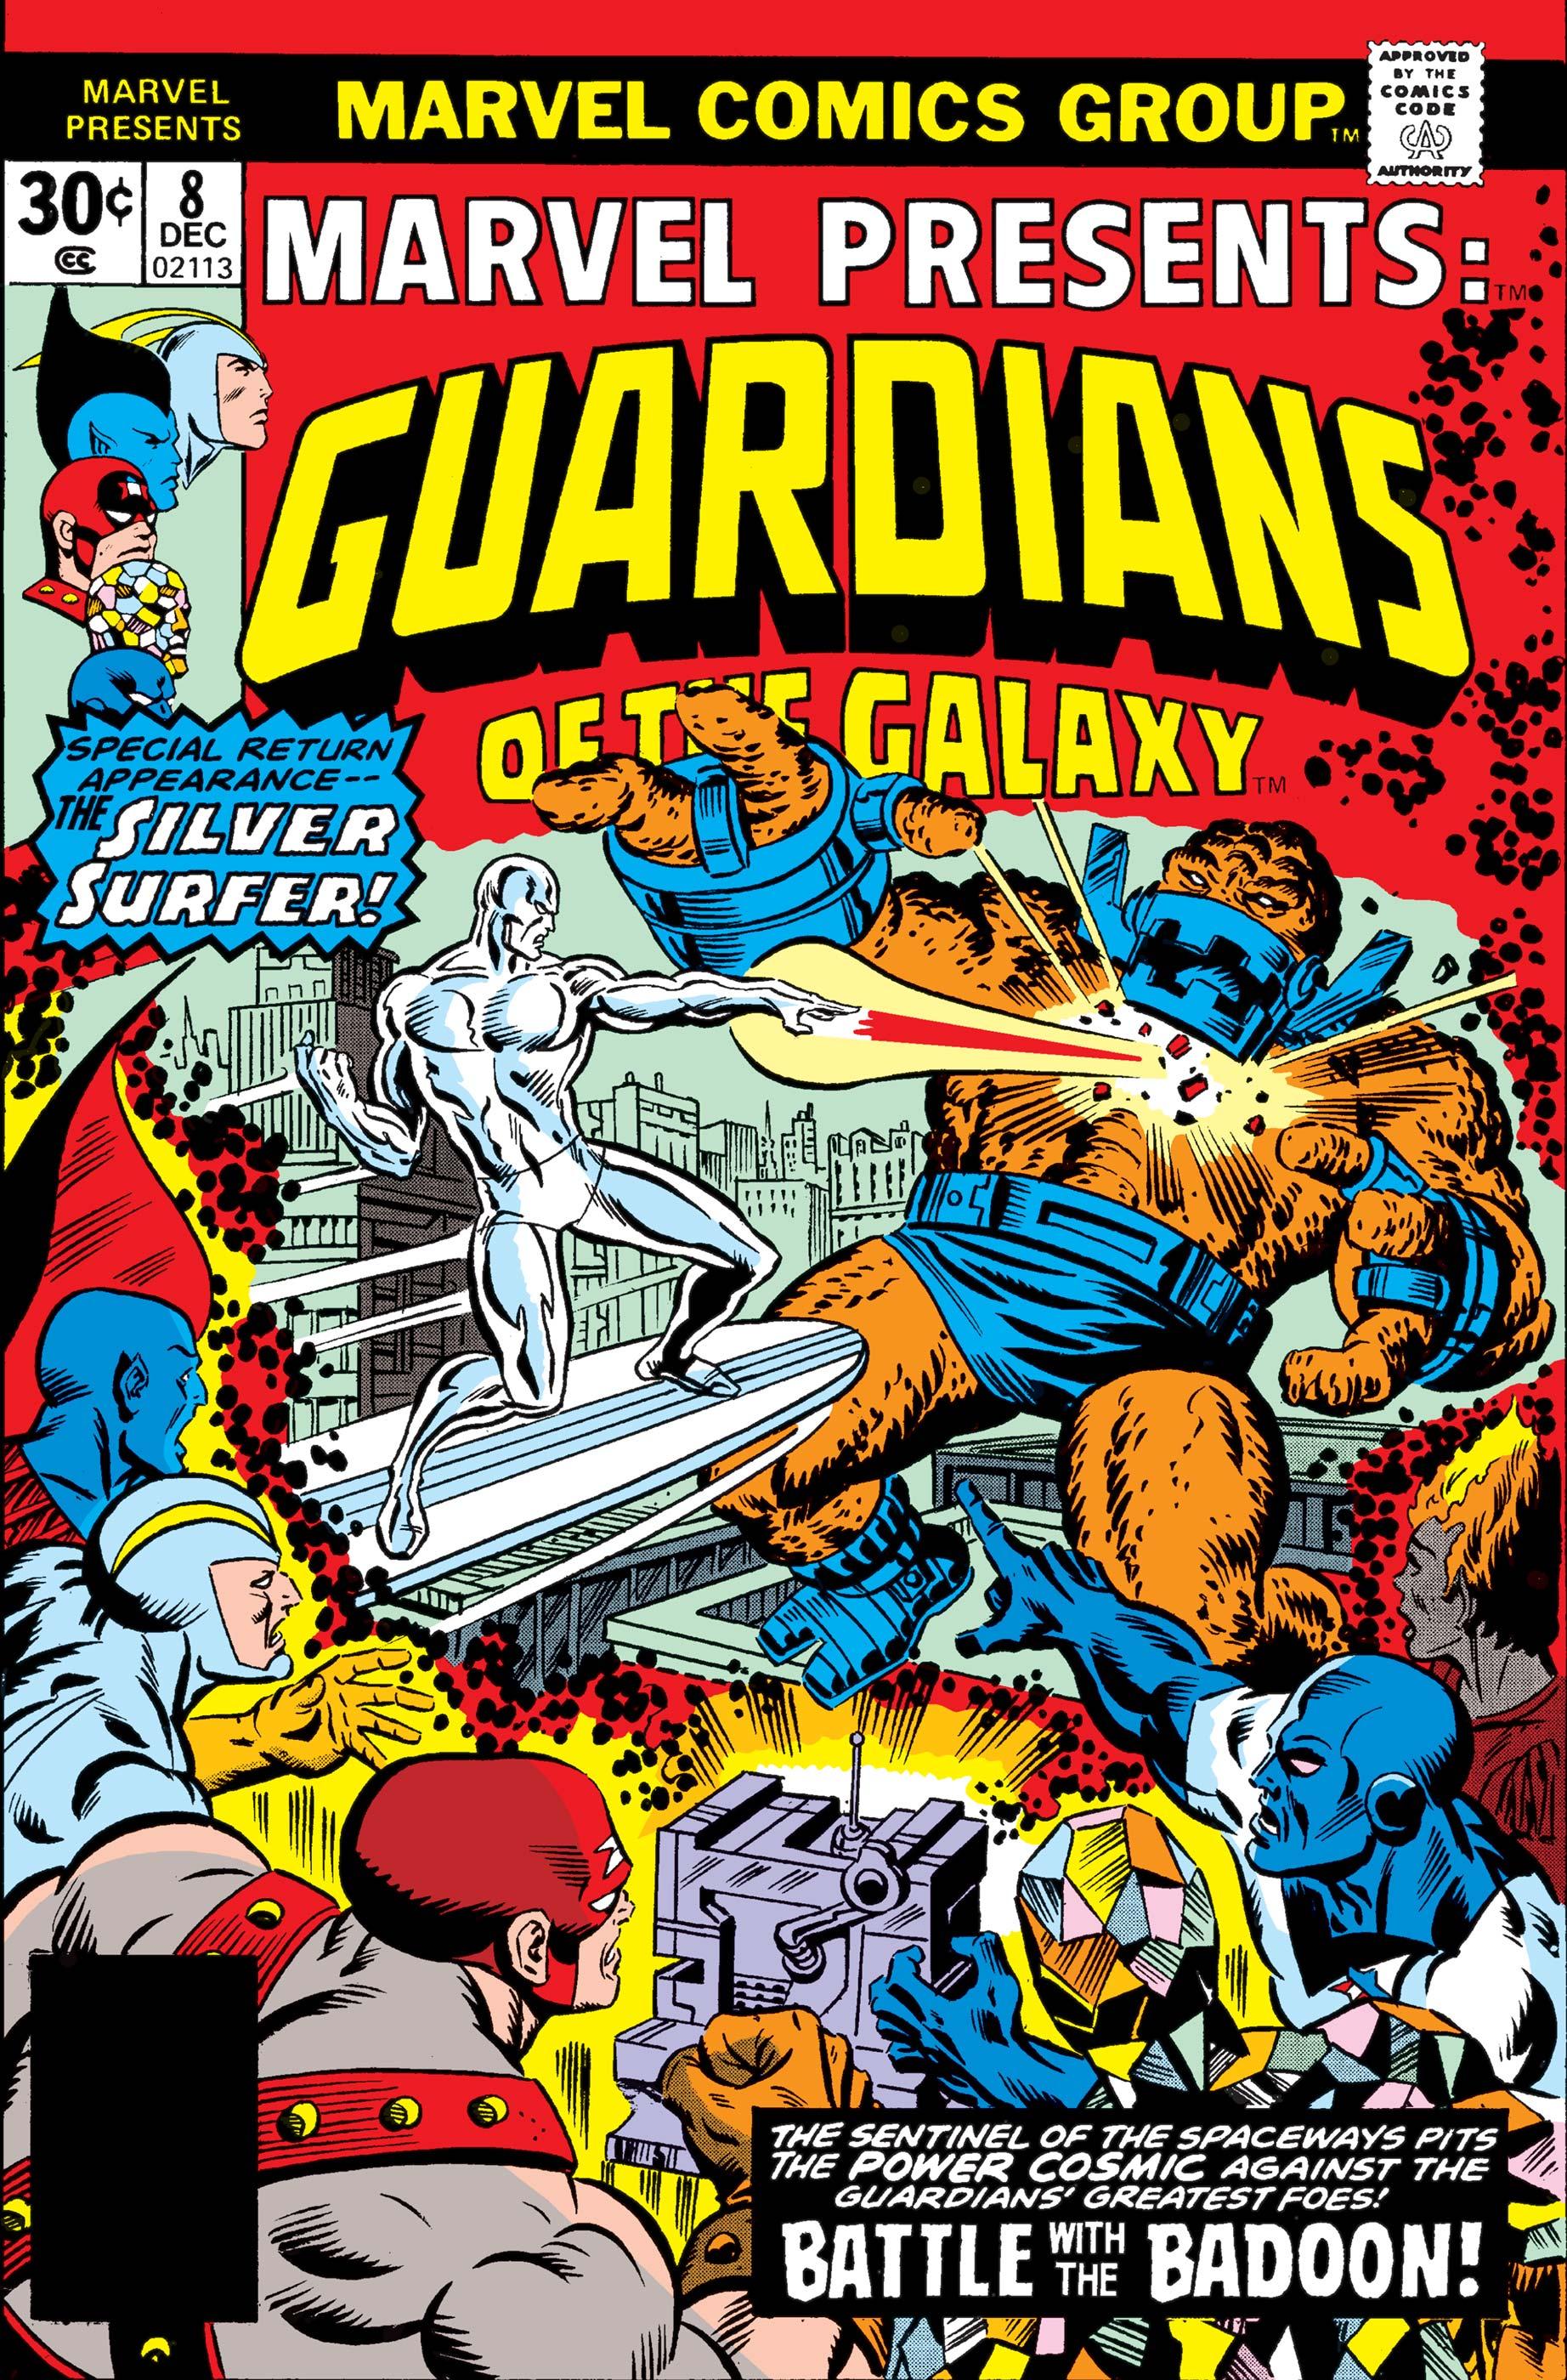 Marvel Presents (1975) #8